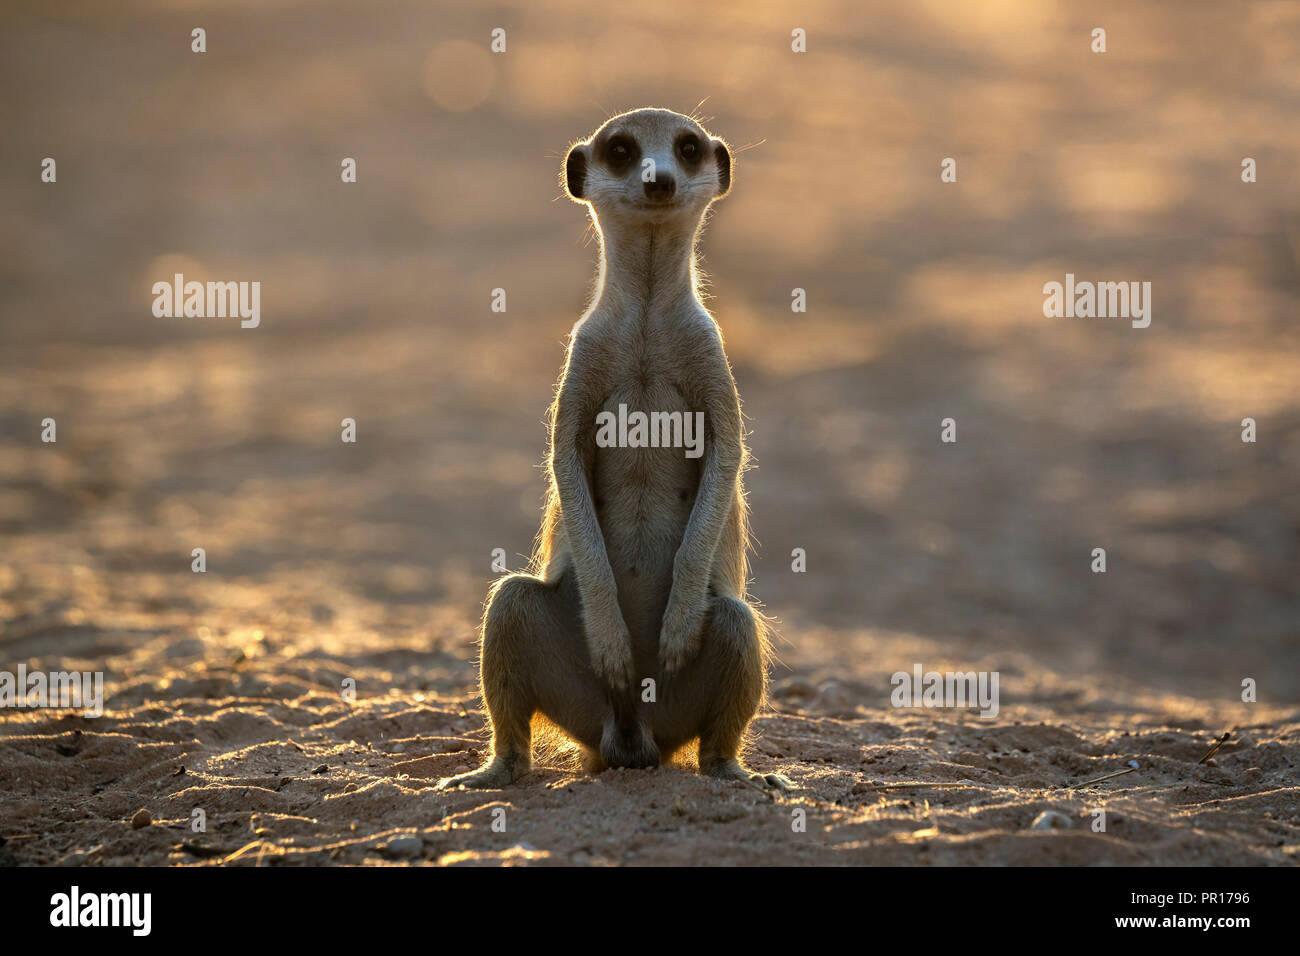 Meerkat (Suricata suricatta), Kgalagadi Parco transfrontaliero, Sud Africa e Africa Immagini Stock